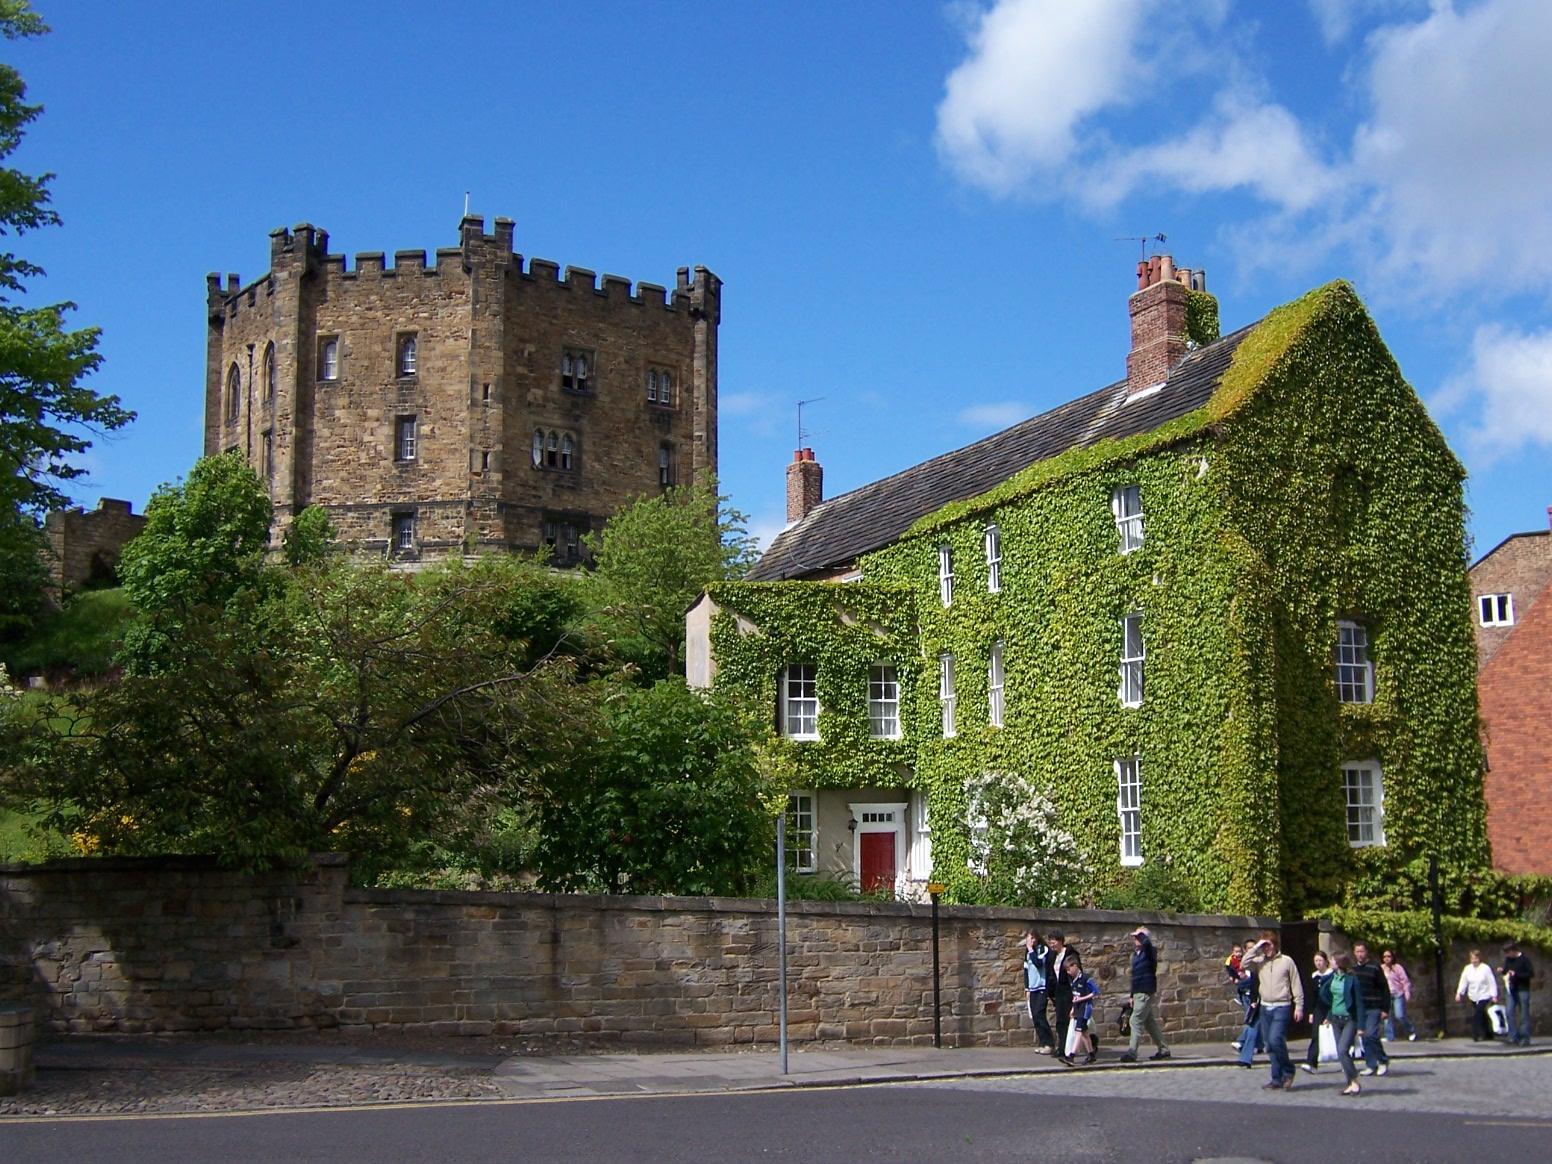 File:Durham Castle Bergfried.jpg - Wikimedia Commons